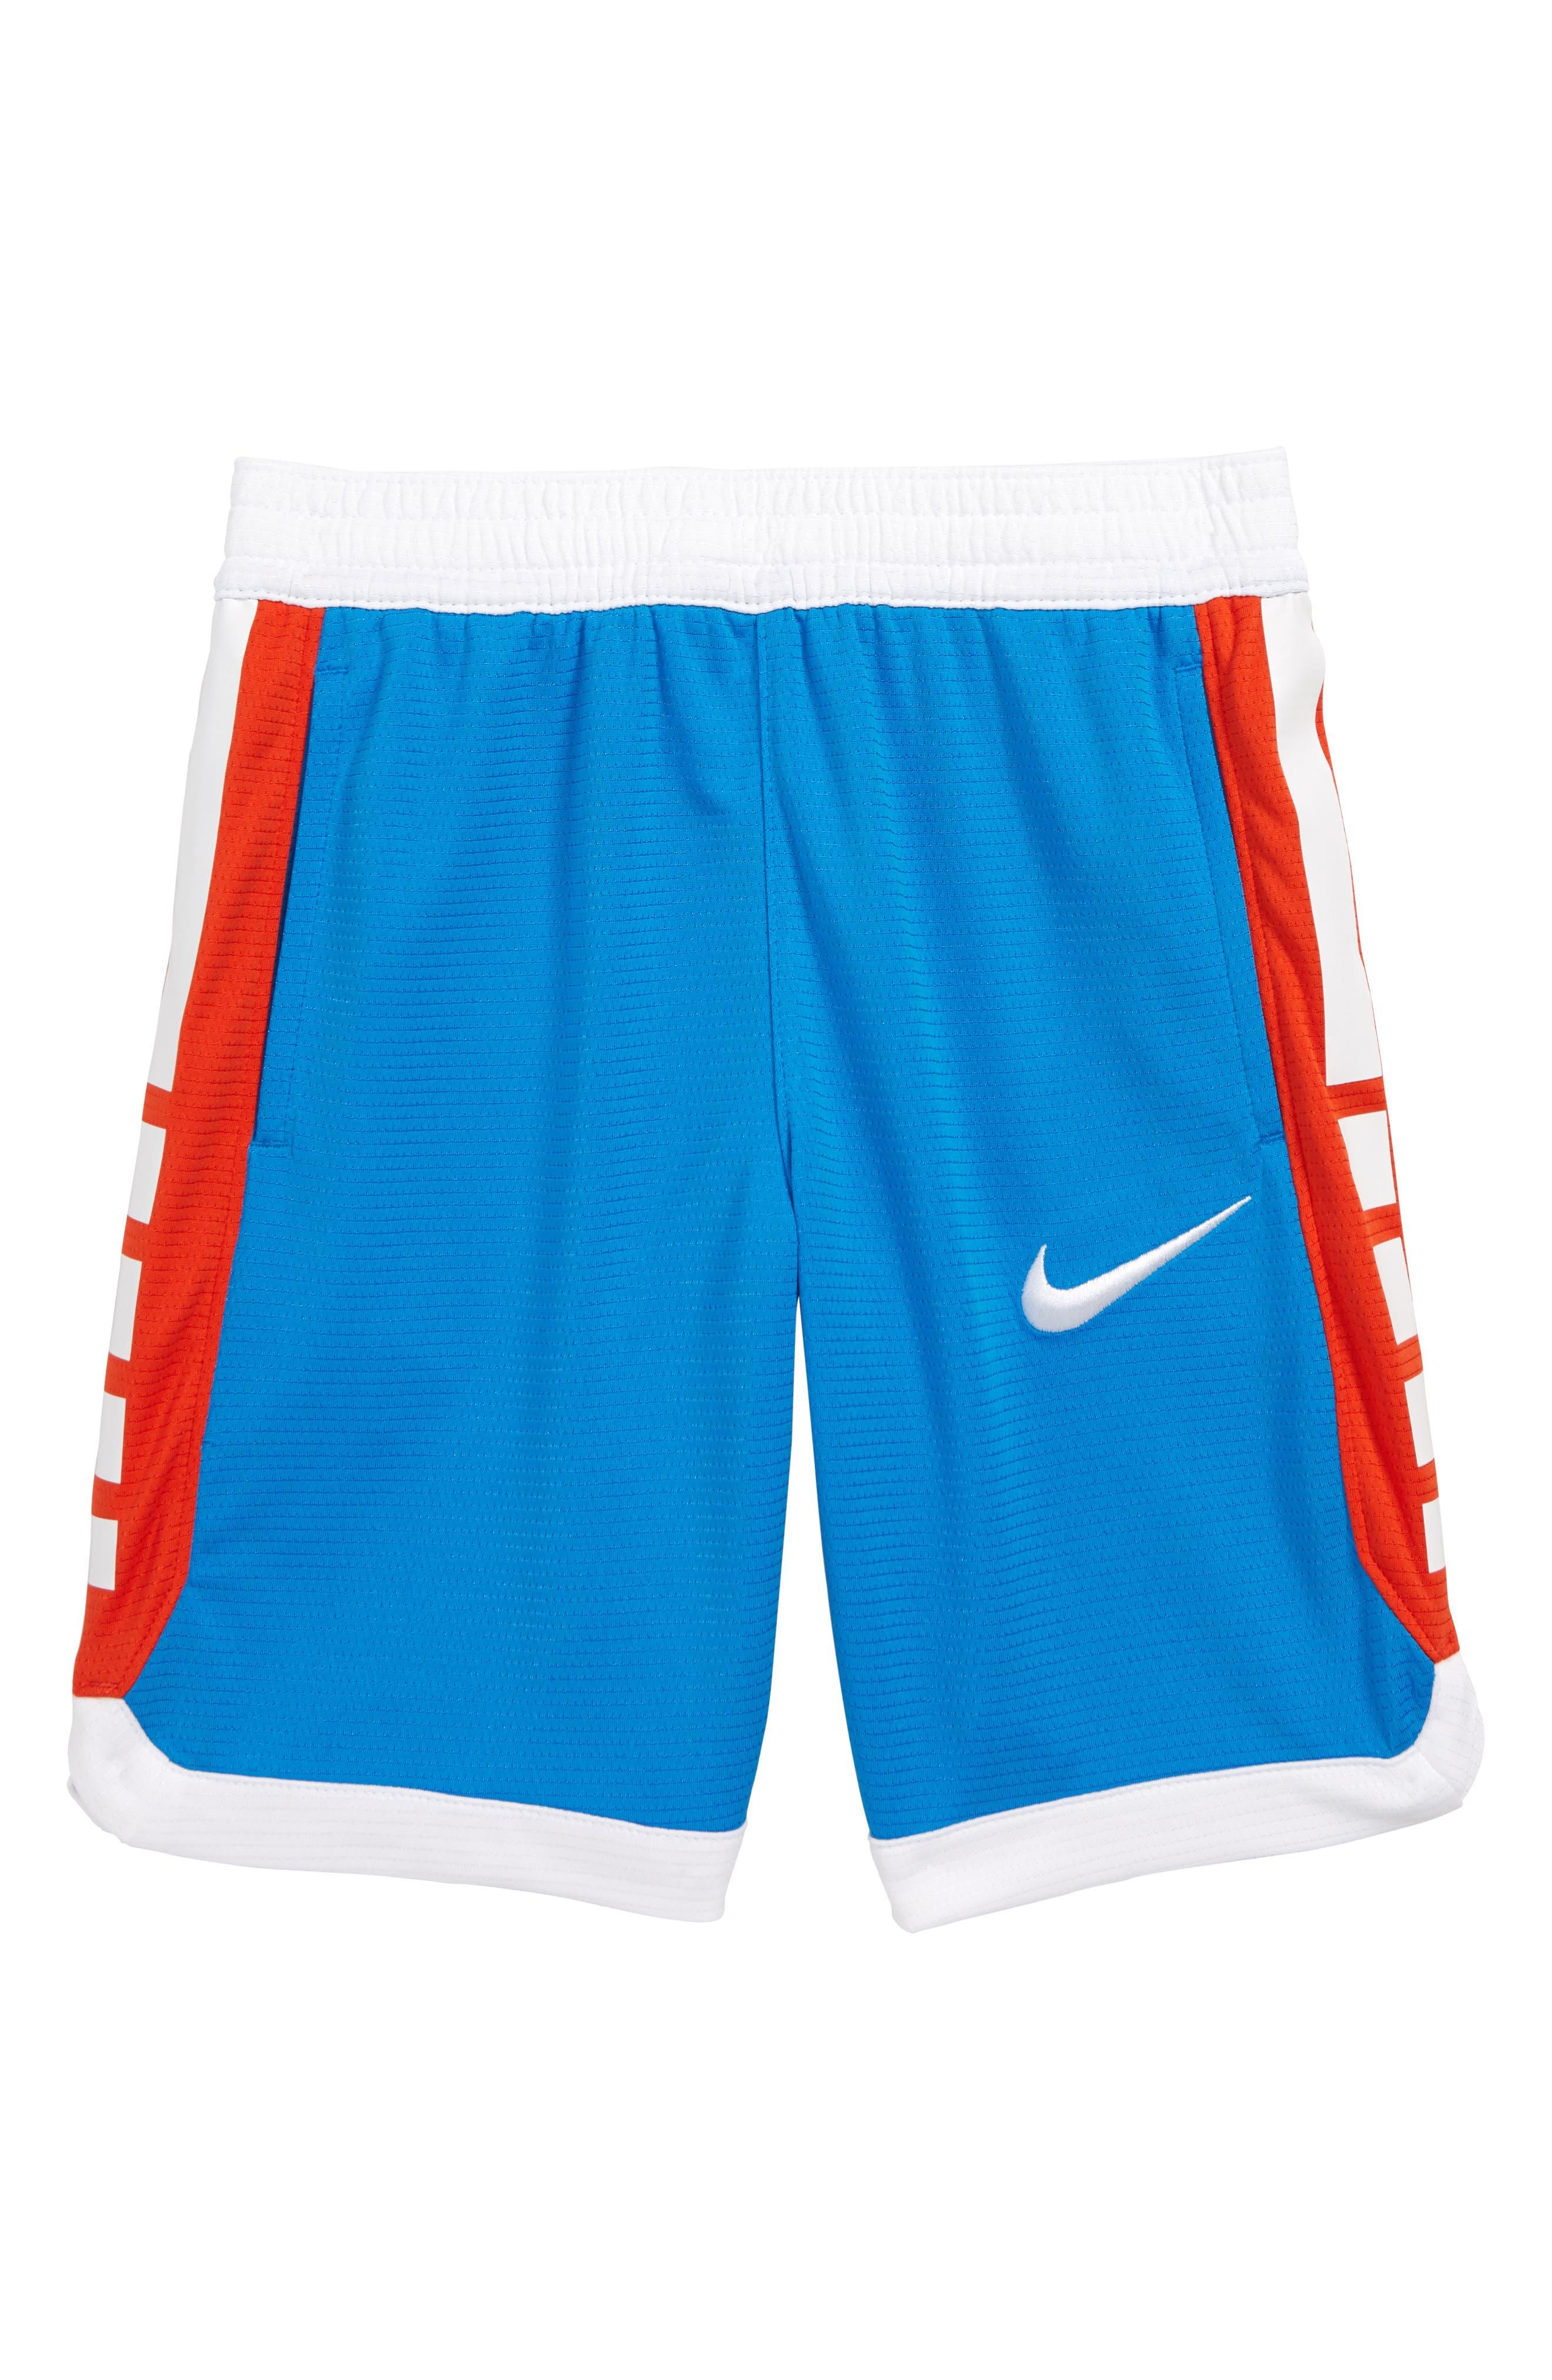 Boys Nike Dry Elite Stripe Athletic Shorts Size 7  Blue